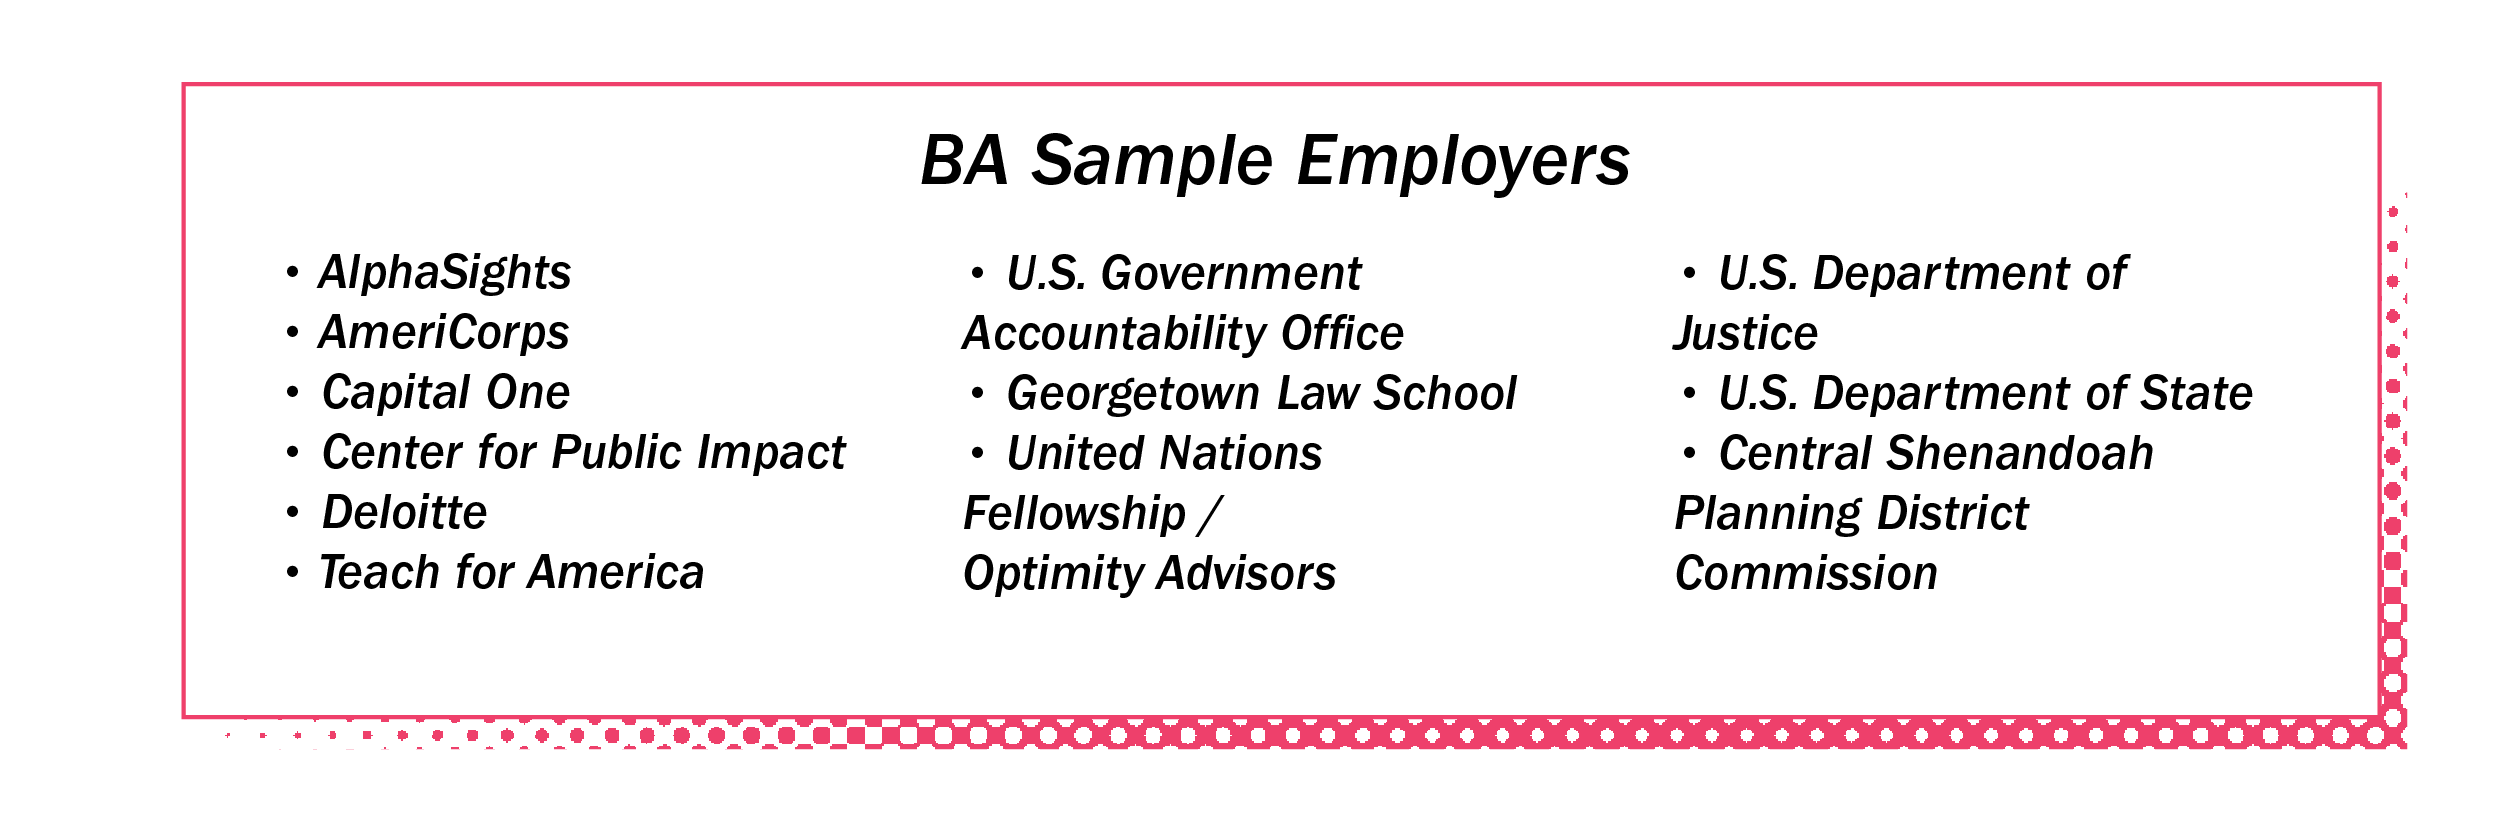 BA Sample Employers